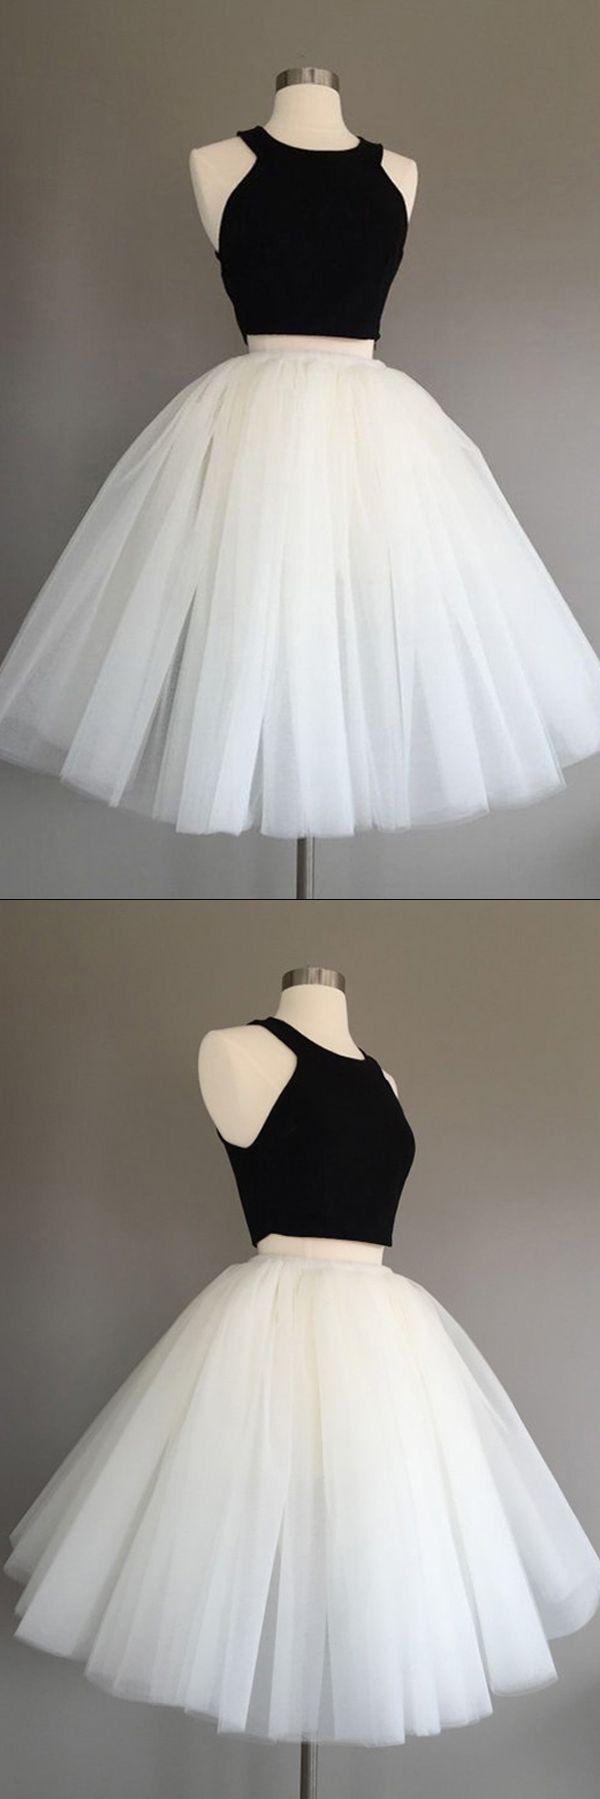 best dresses images on pinterest ball gown ballroom dress